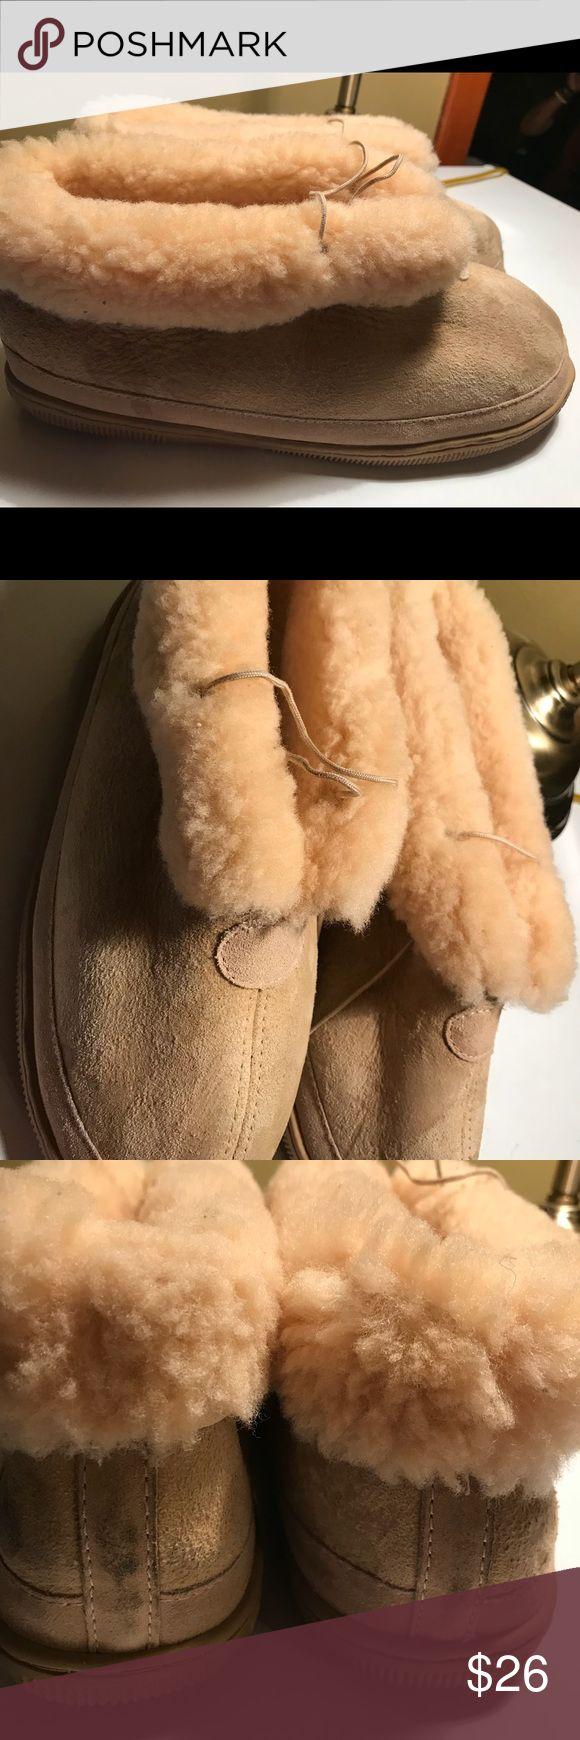 Winter ❄️ Genuine Australian Sheepskin Slippers 11 Excellent Condition UNISEX Slippers M 11- L12 Australian Sheepskin Shoes Loafers & Slip-Ons